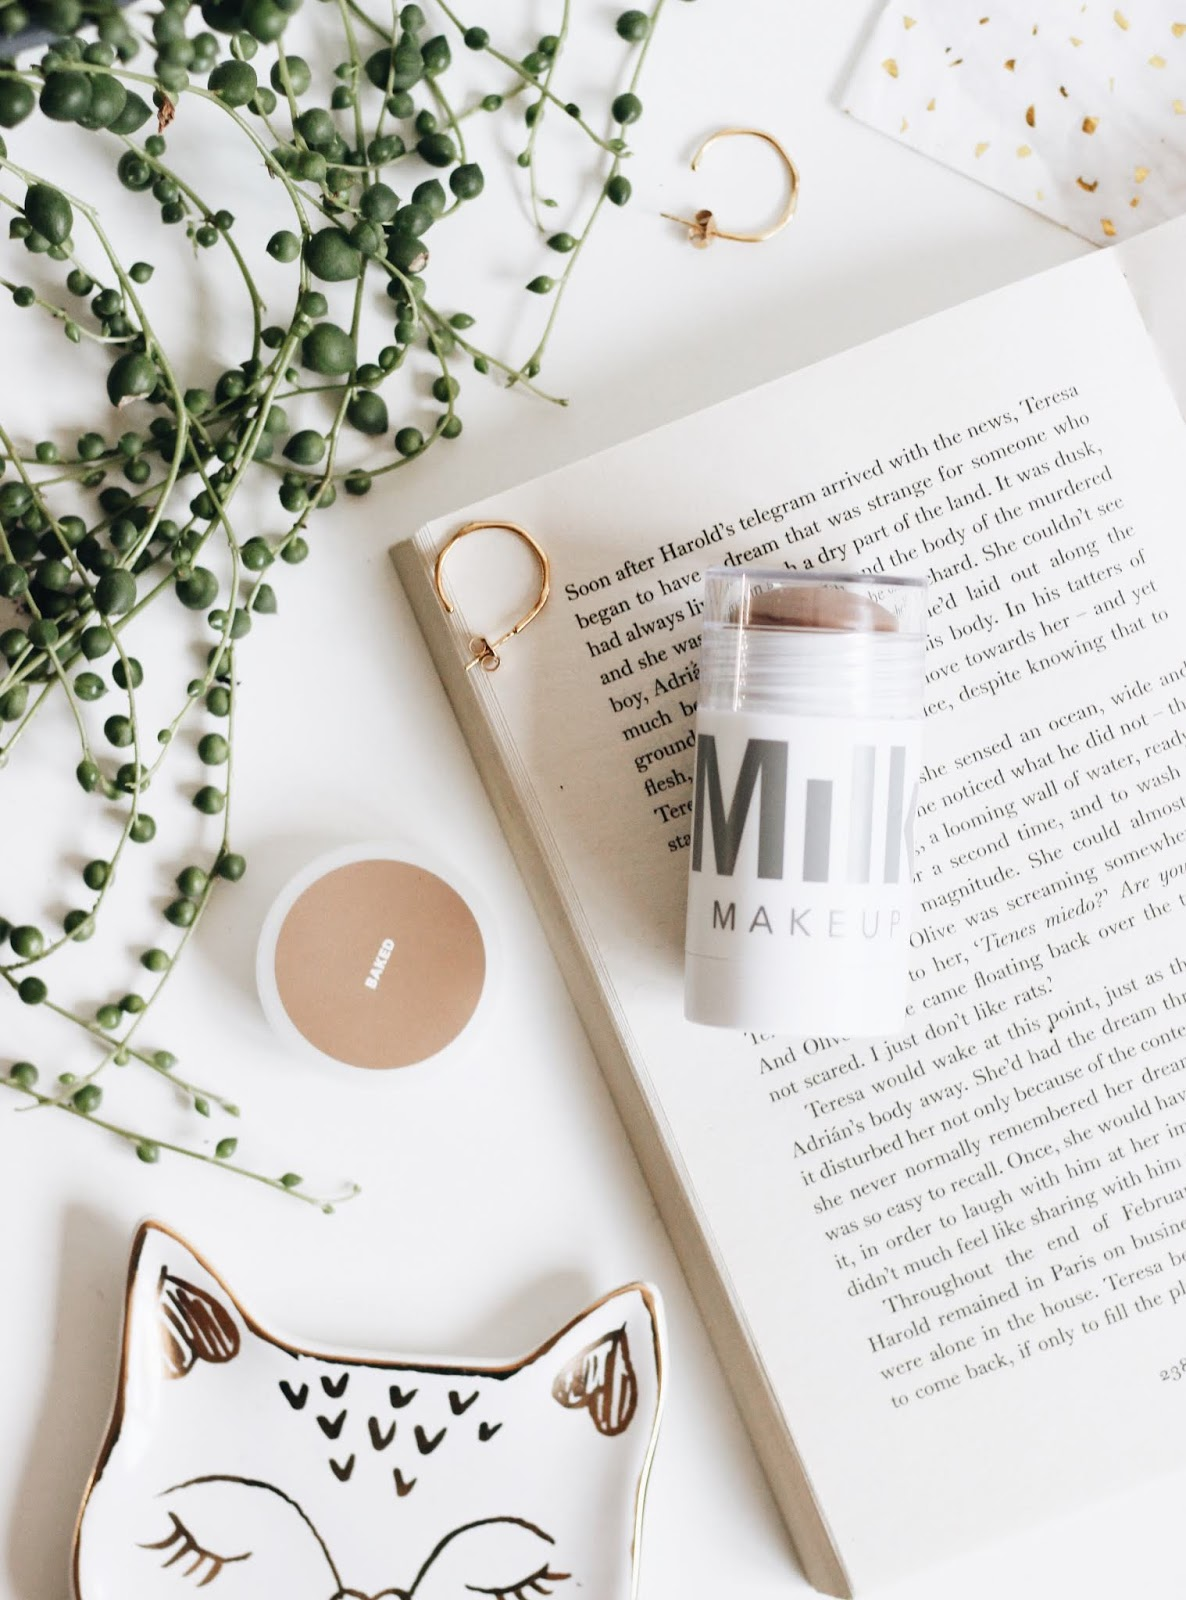 Milk Makeup Bronzer Baked Review